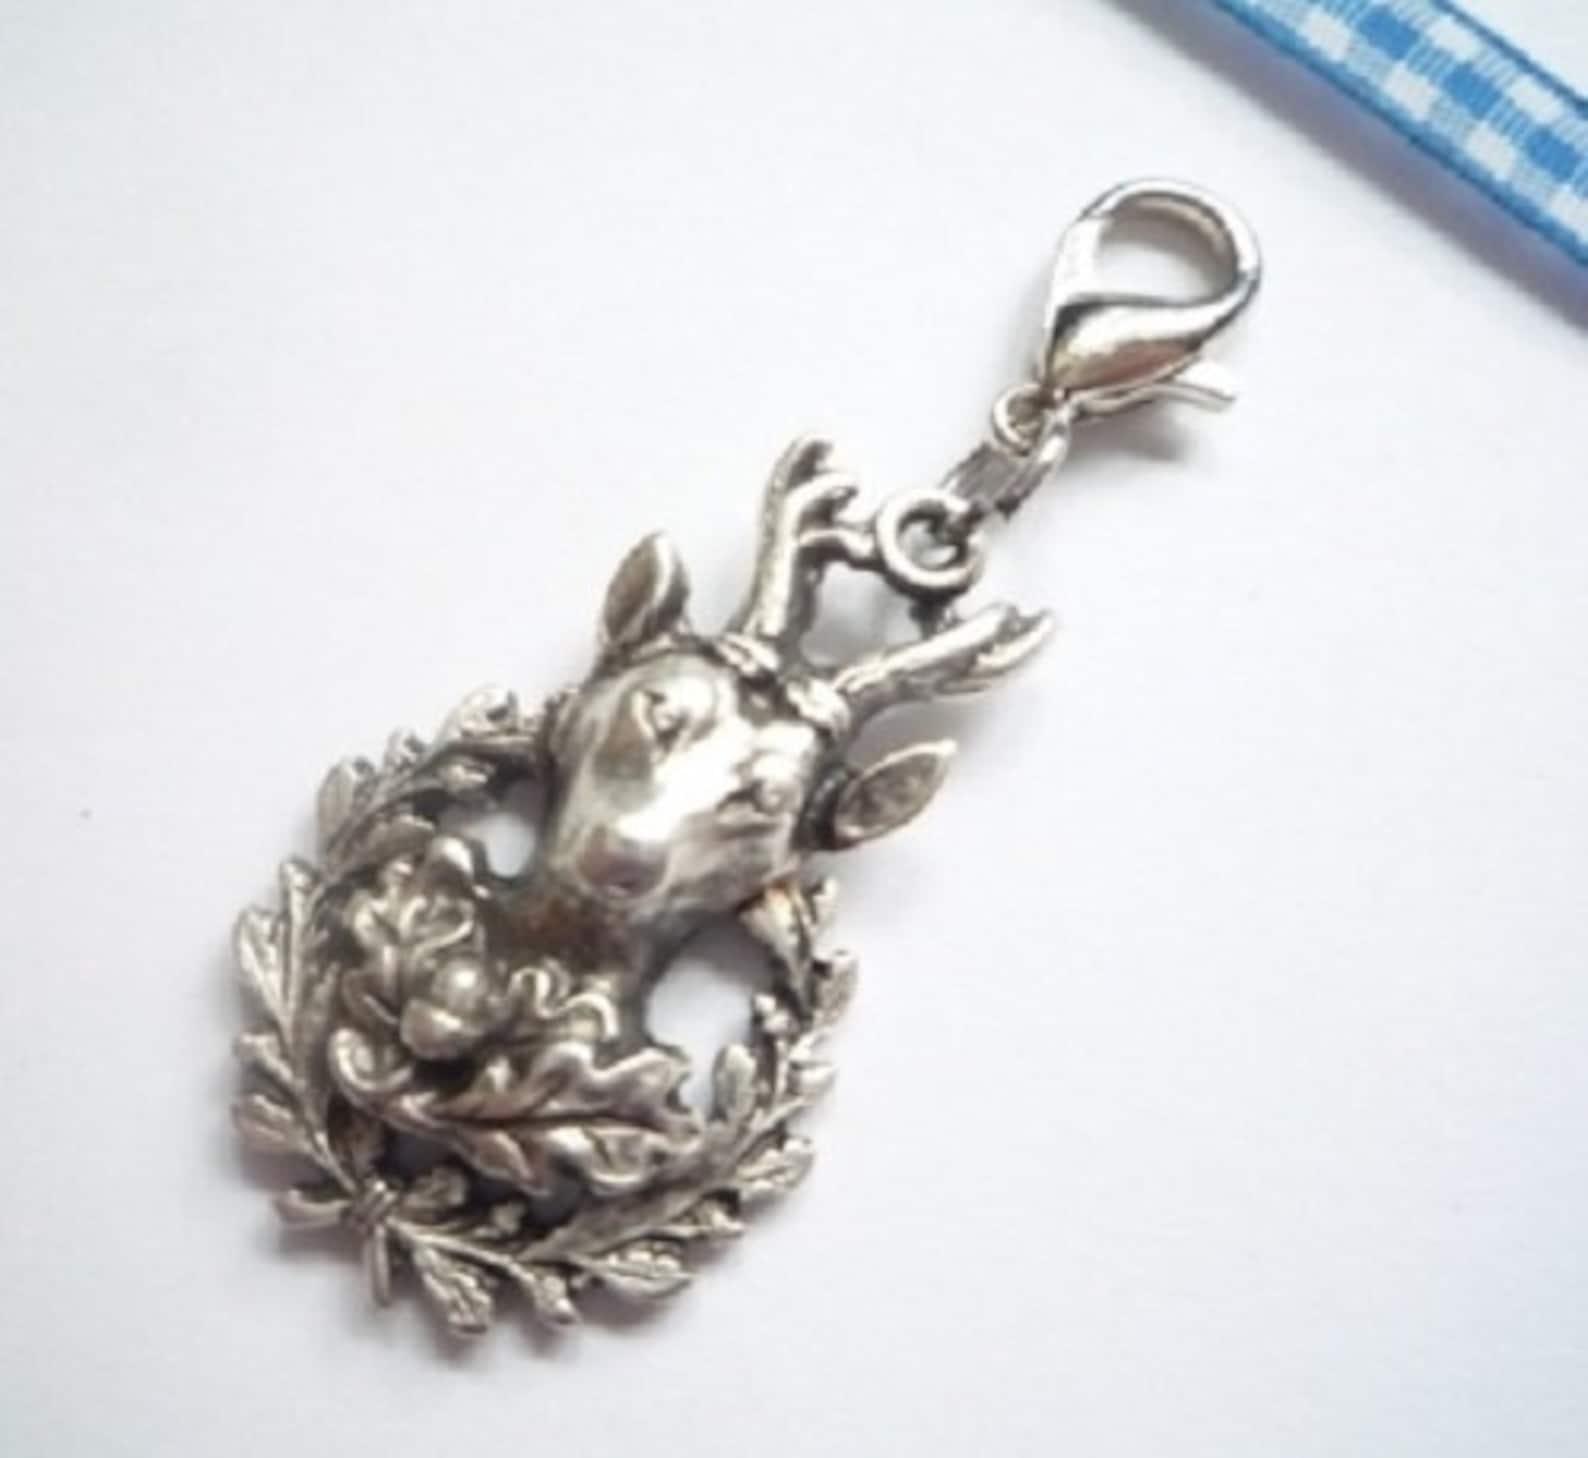 https://www.etsy.com/listing/625181401/charivari-pendant-deer-head-with-oak